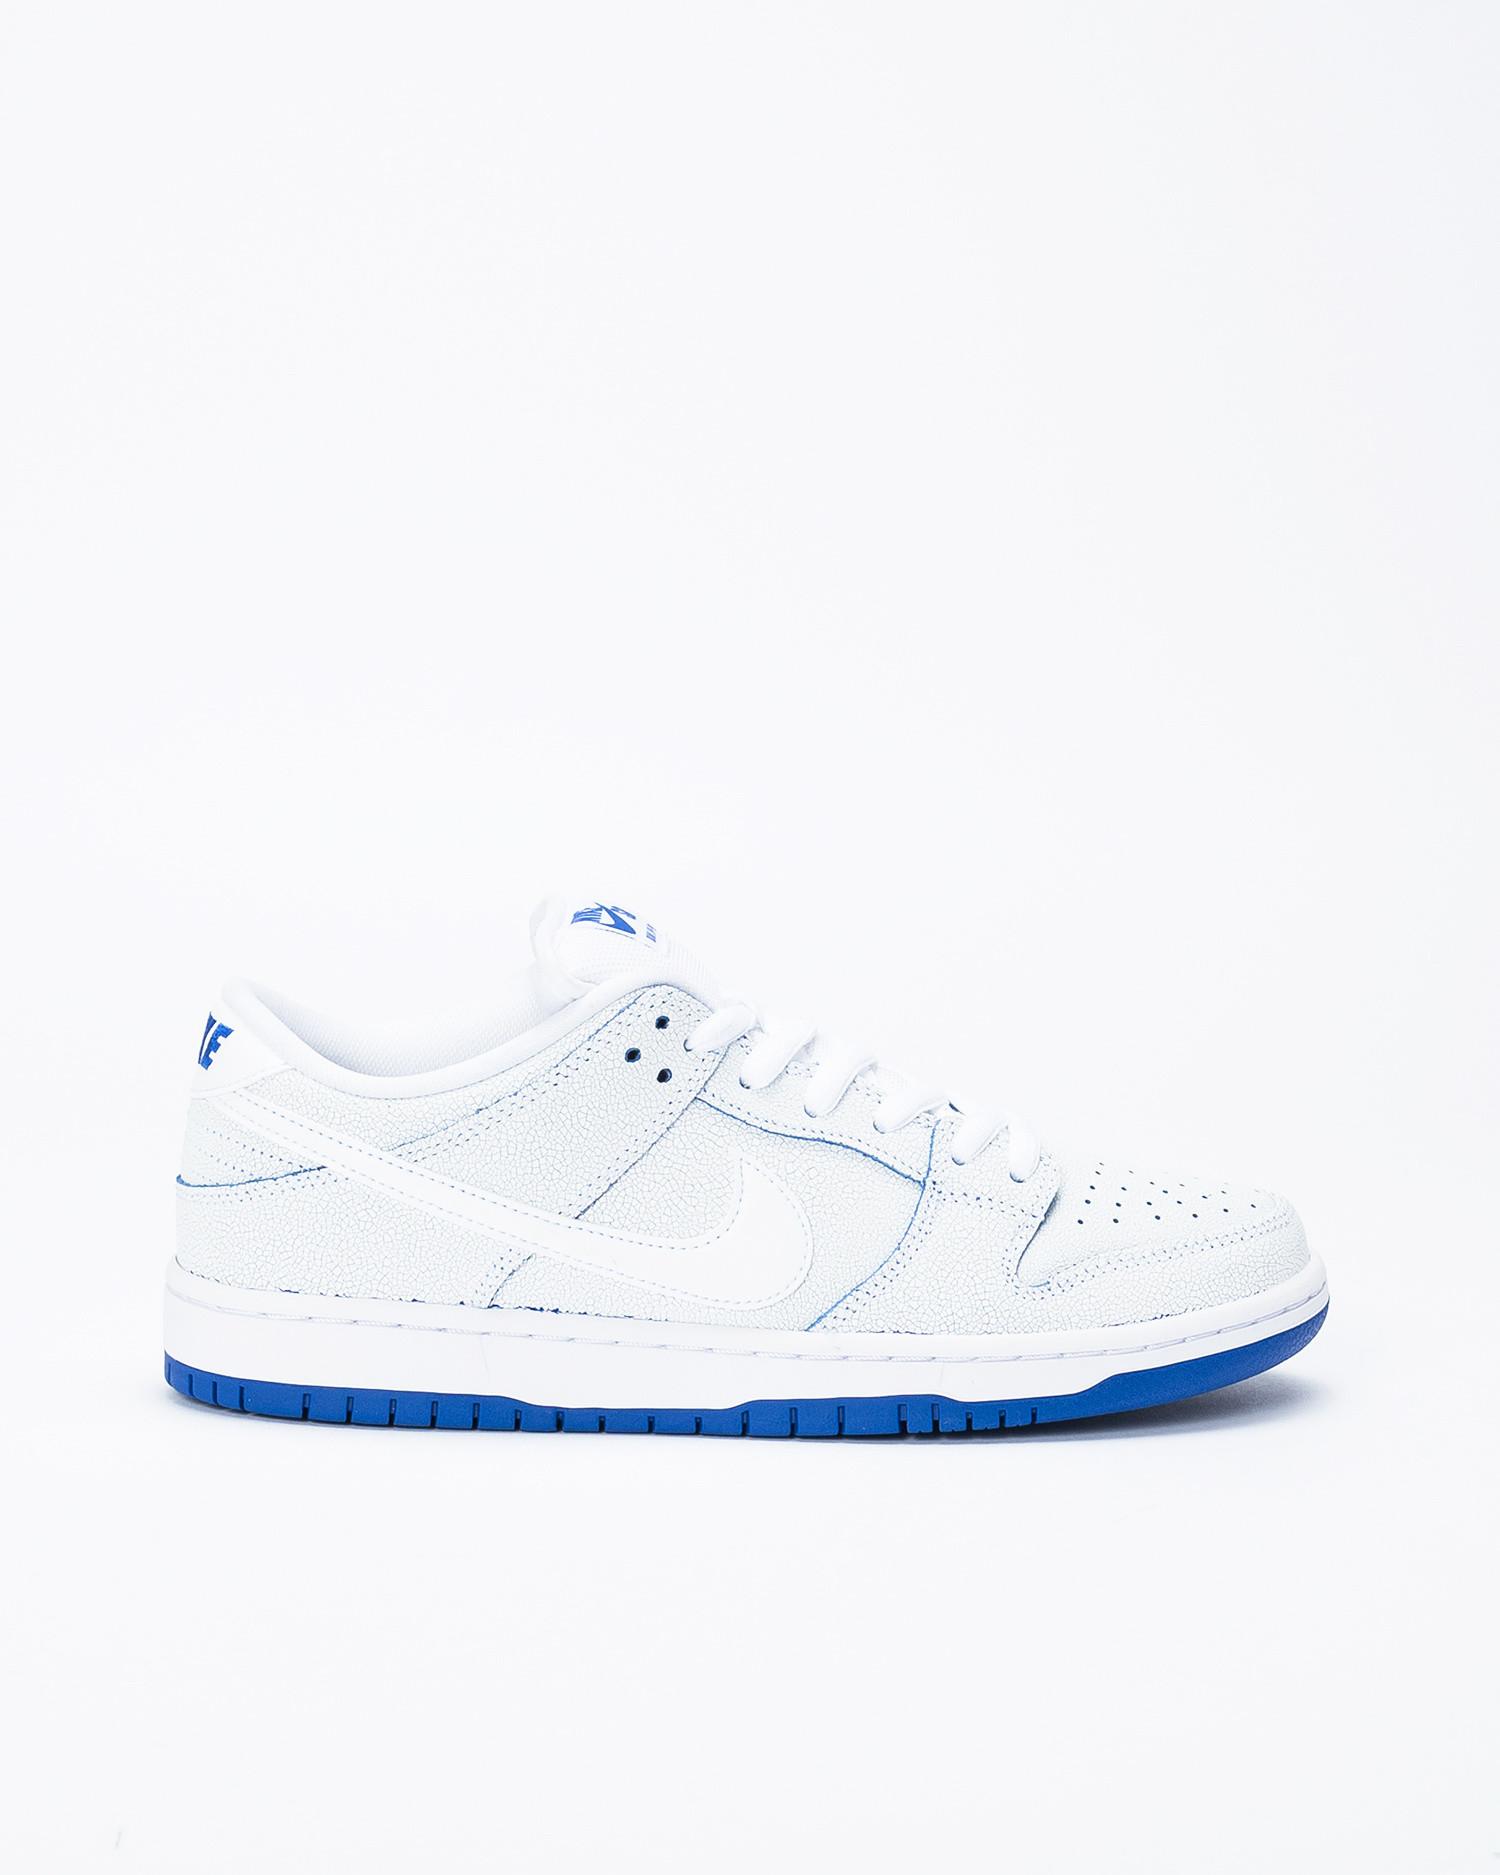 big sale 1457a 2c066 Nike SB Dunk Low Pro Premium White/White